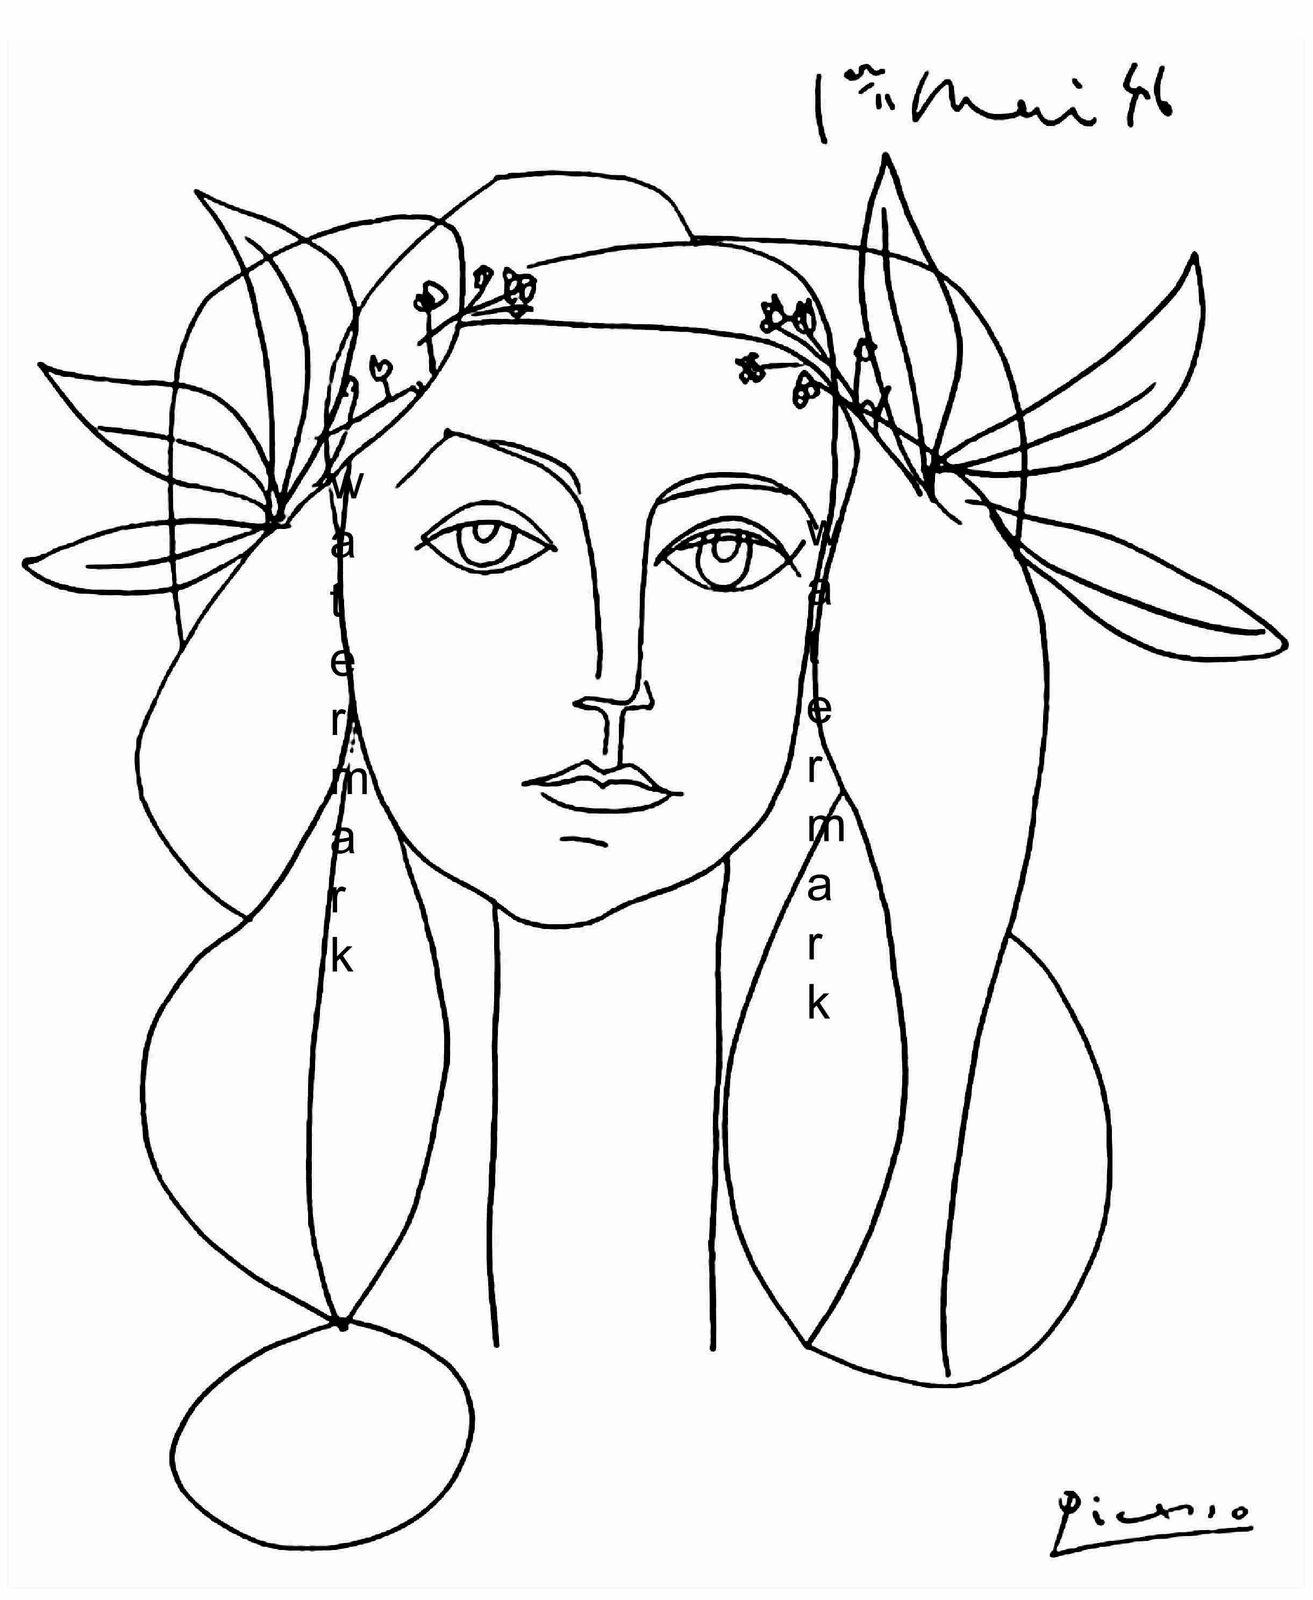 Picasso head 5a